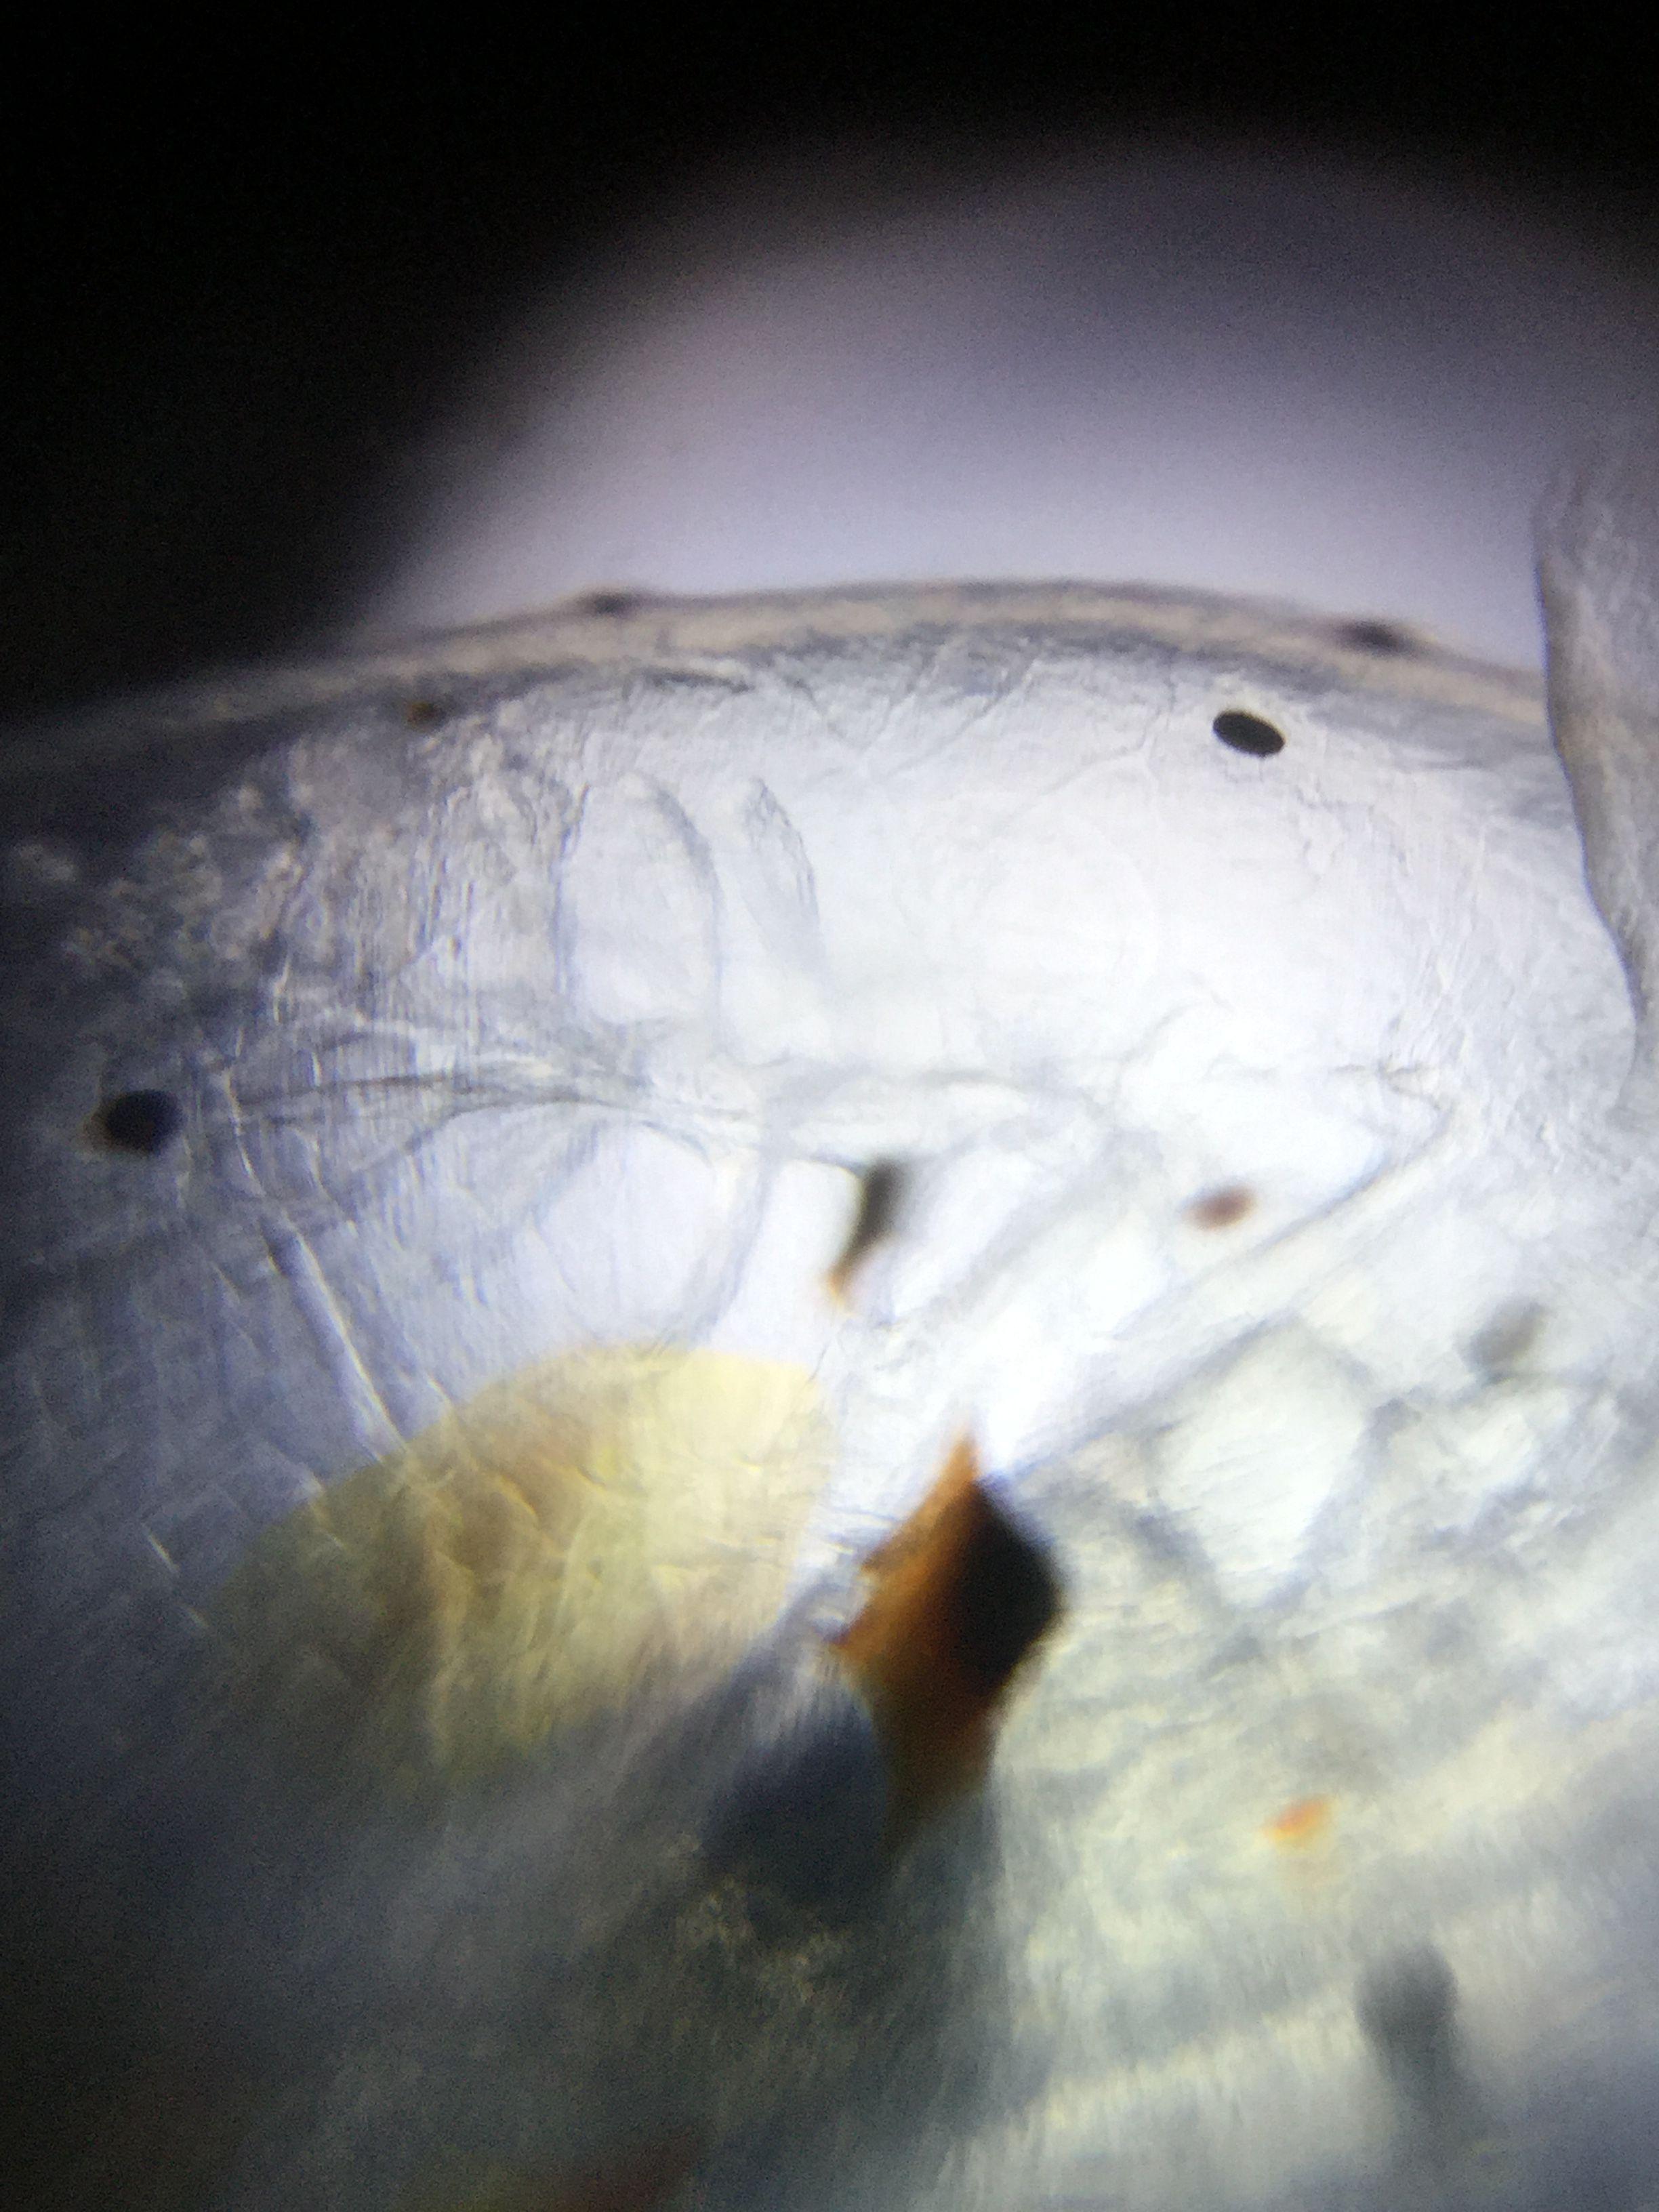 Foldscope-image-2.JPG#asset:4216